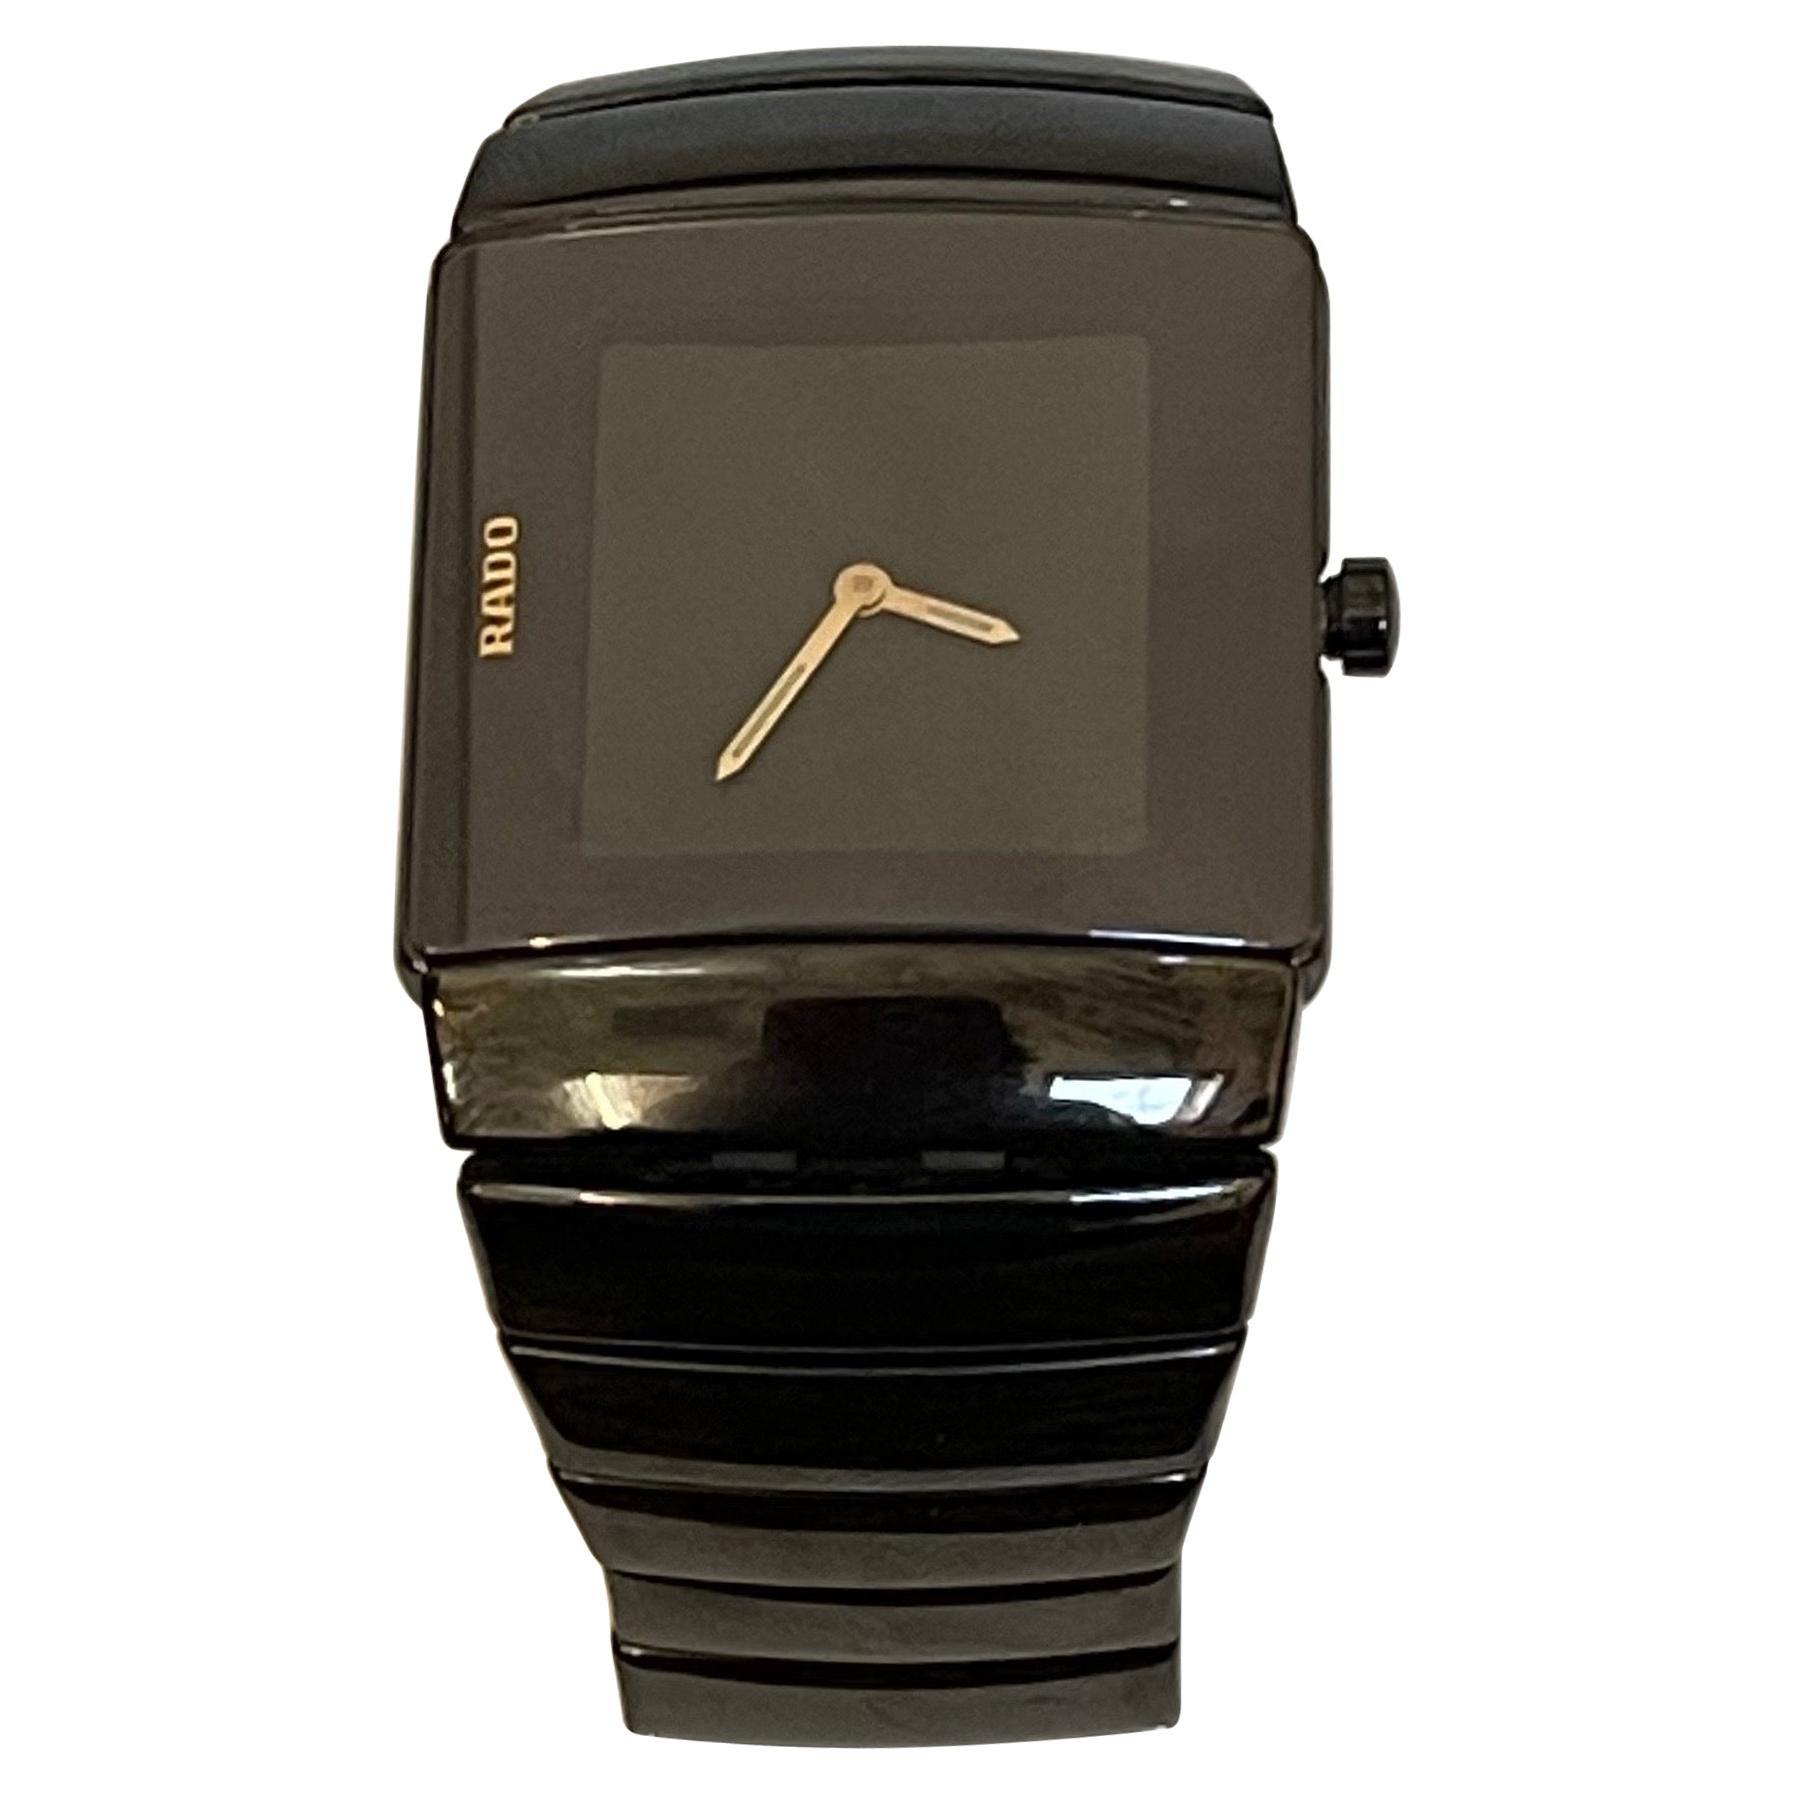 RADO Sintra Jubile Analog/Digital Black Dial Men's Watch